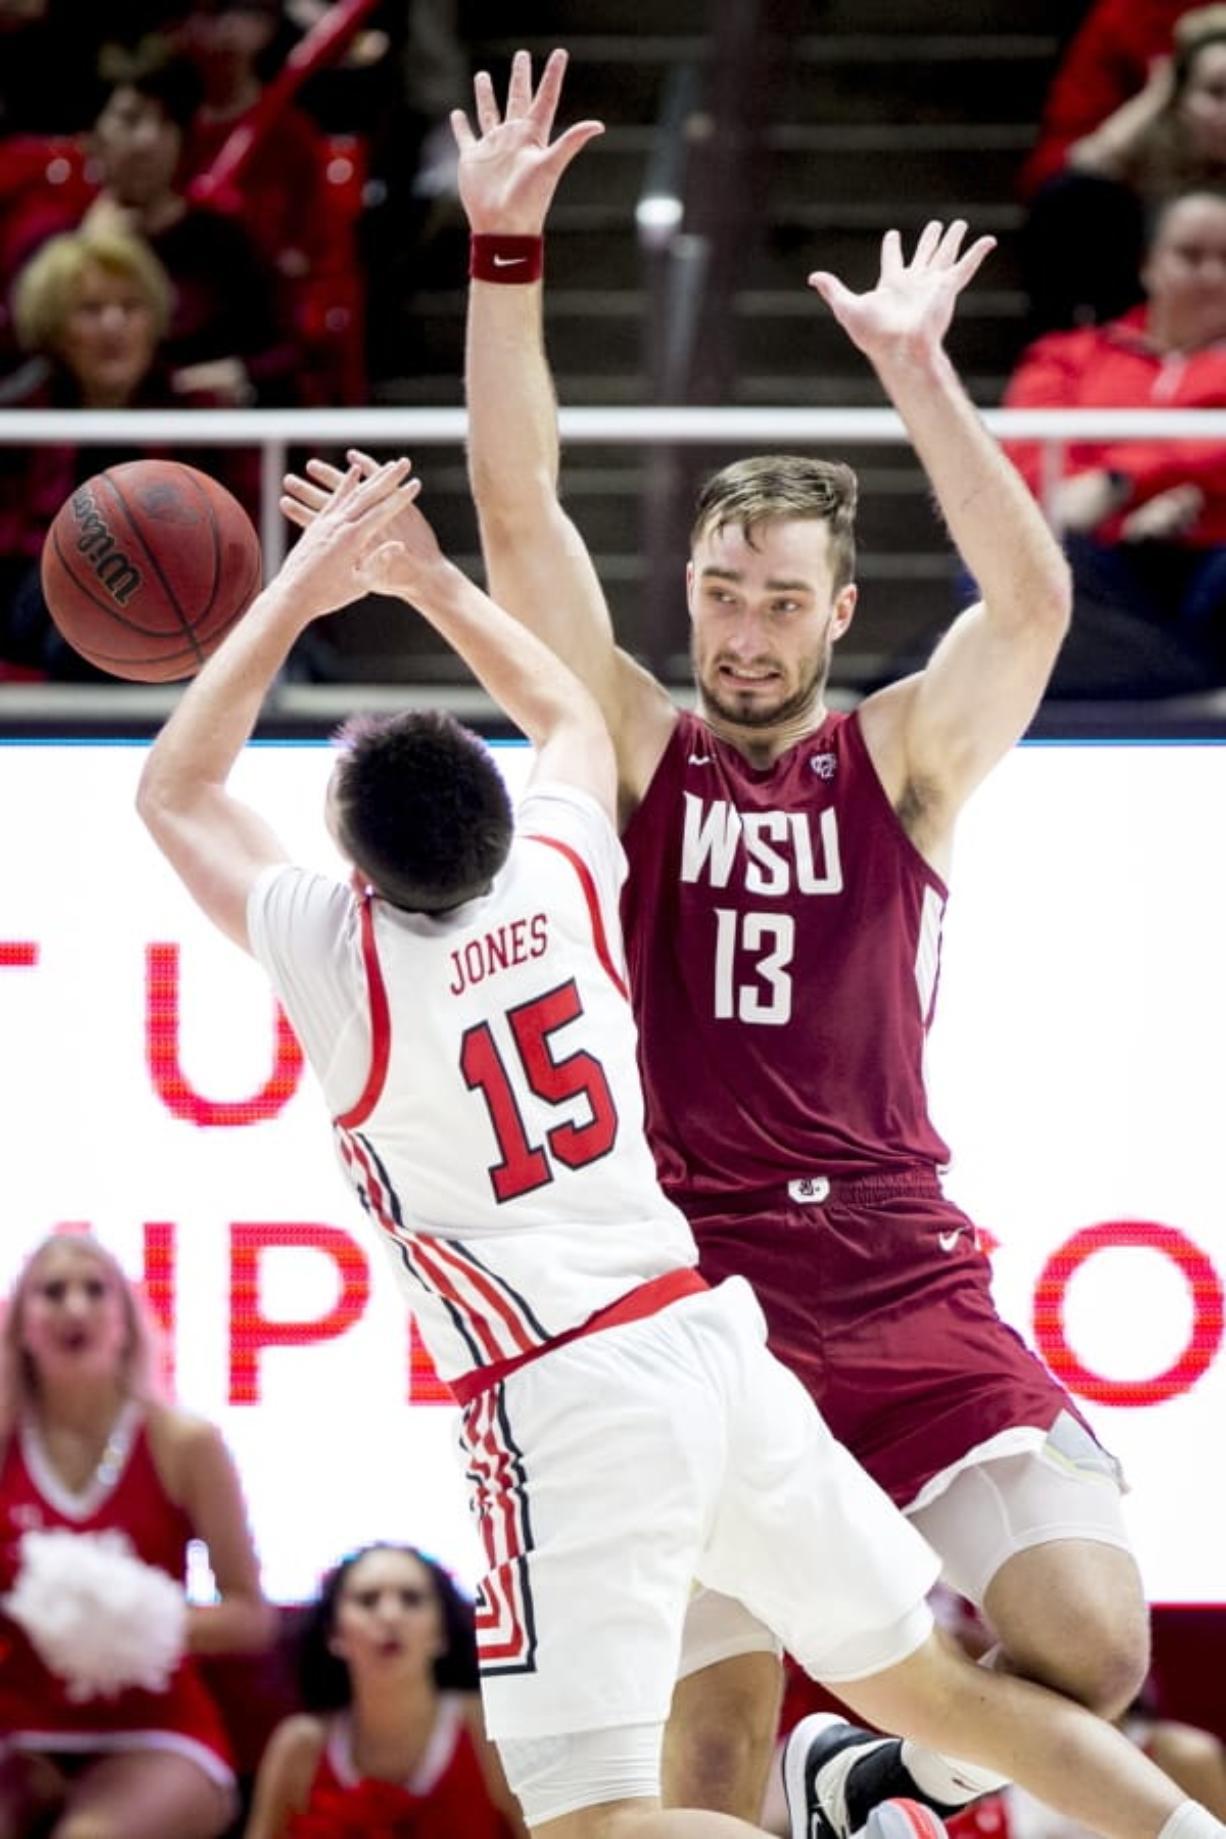 Washington State forward Jeff Pollard (13) fouls Utah guard Rylan Jones (15) who shoots in the second half during an NCAA college basketball game Saturday, Jan. 25, 2020, in Salt Lake City.